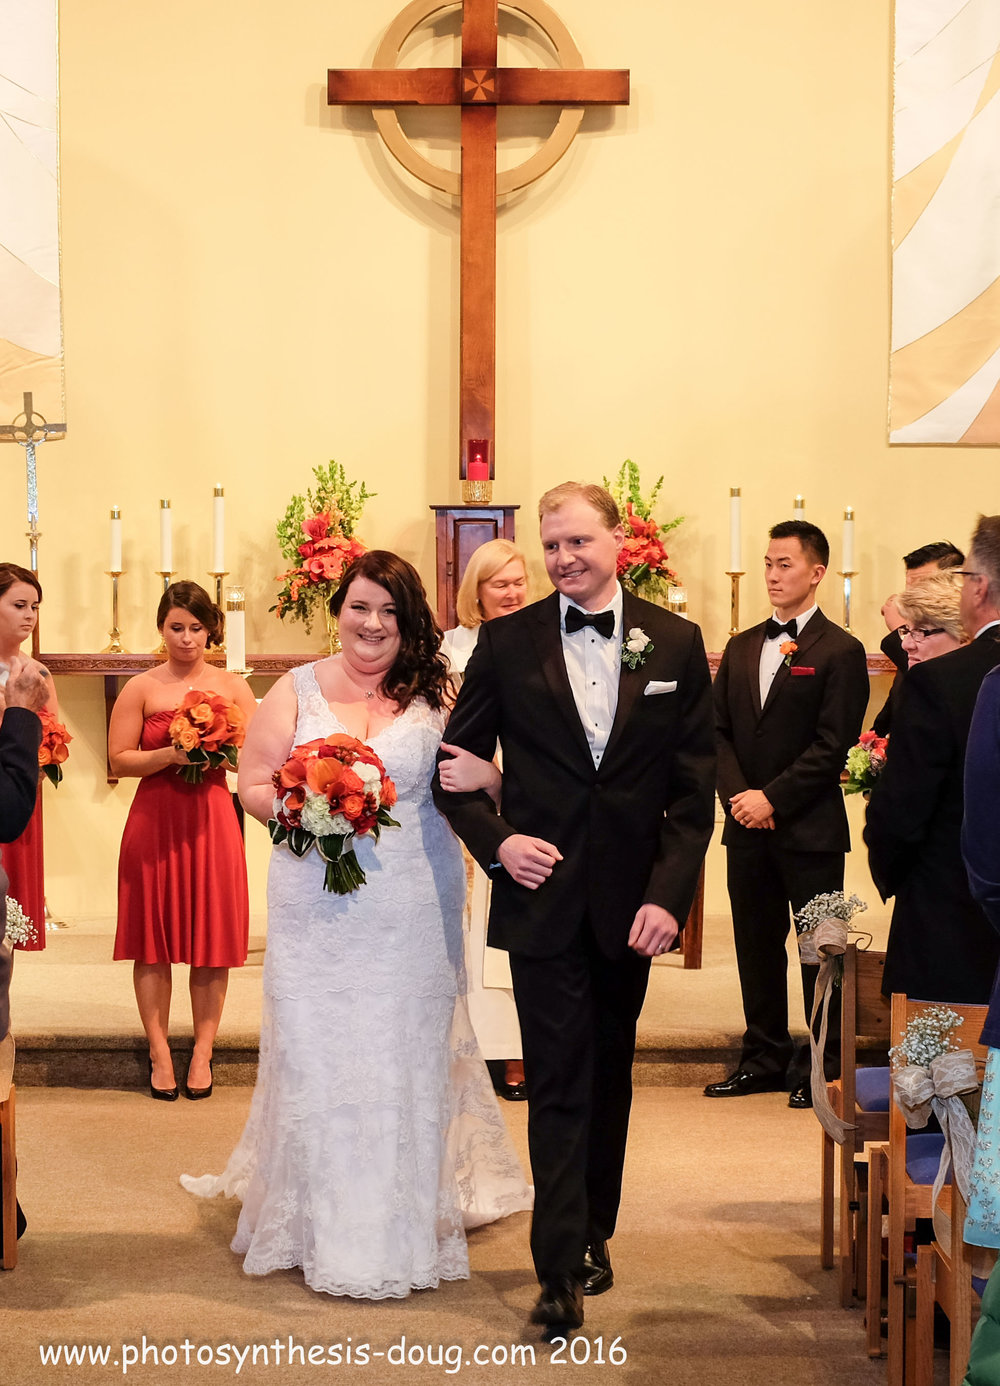 Brides by Doug-9609.jpg